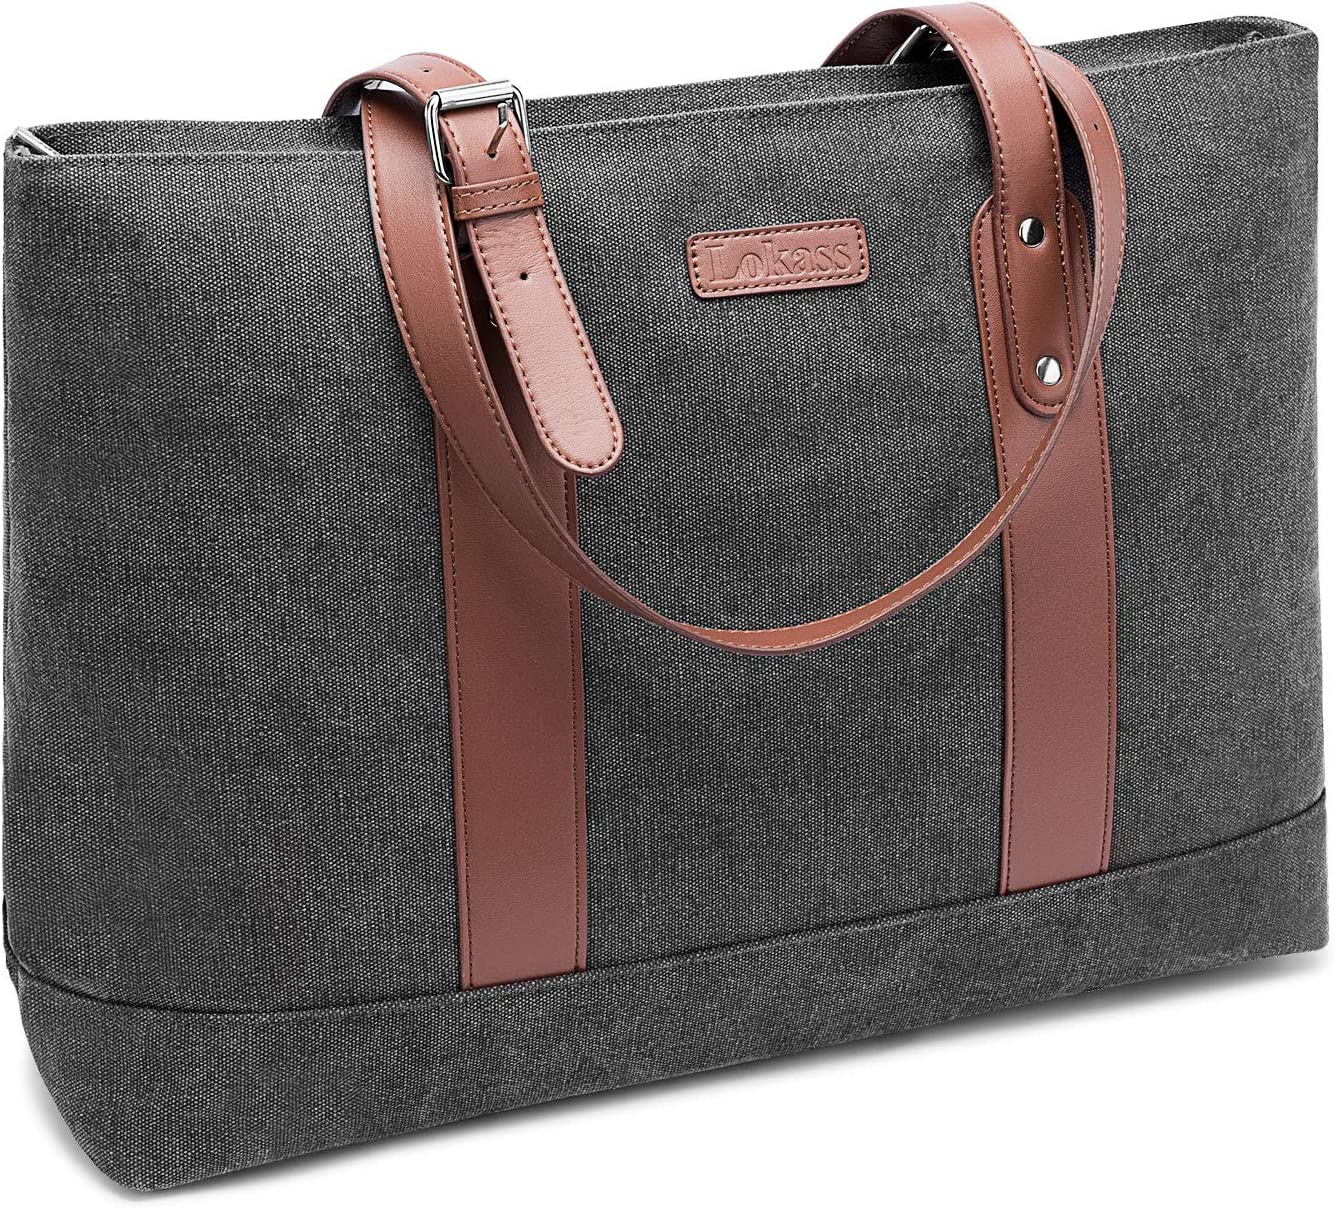 DTBG Laptop Tote Bag 15.6Inches Laptop Bag Nylon Shoulder Bag Women Briefcase Lightweight Handbag with Padded Compartment for Work Business Travel shopping(Dark Grey)